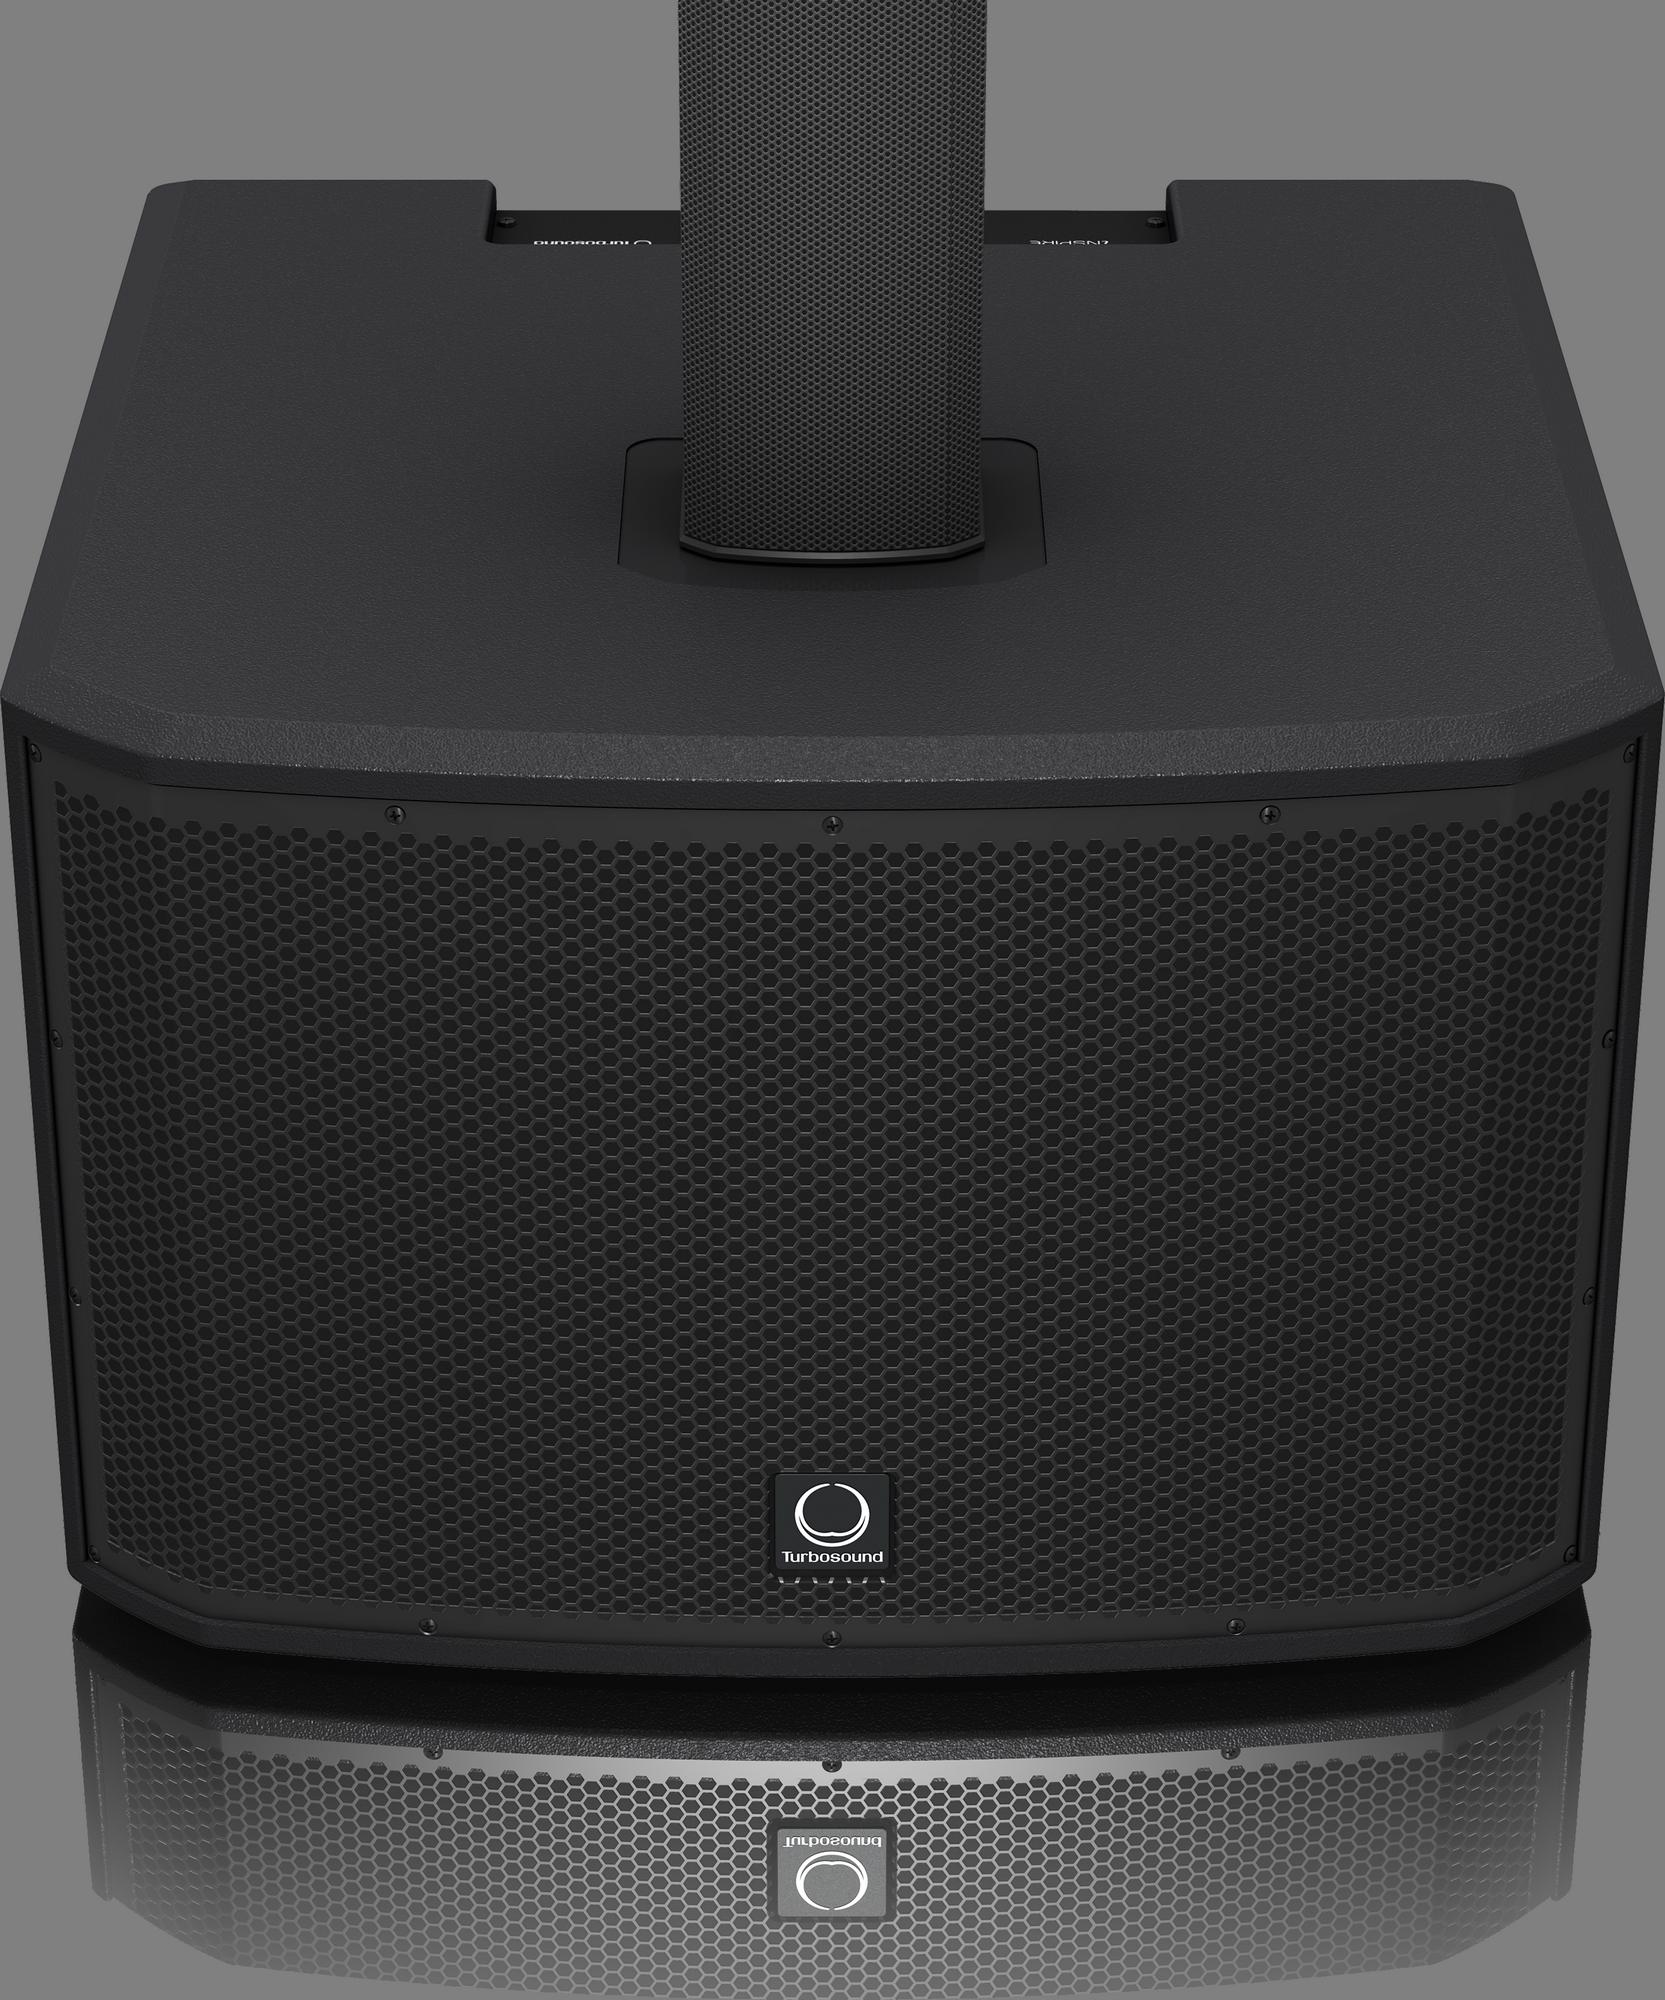 Turbosound  inspire iP3000 - Full range loudspeaker